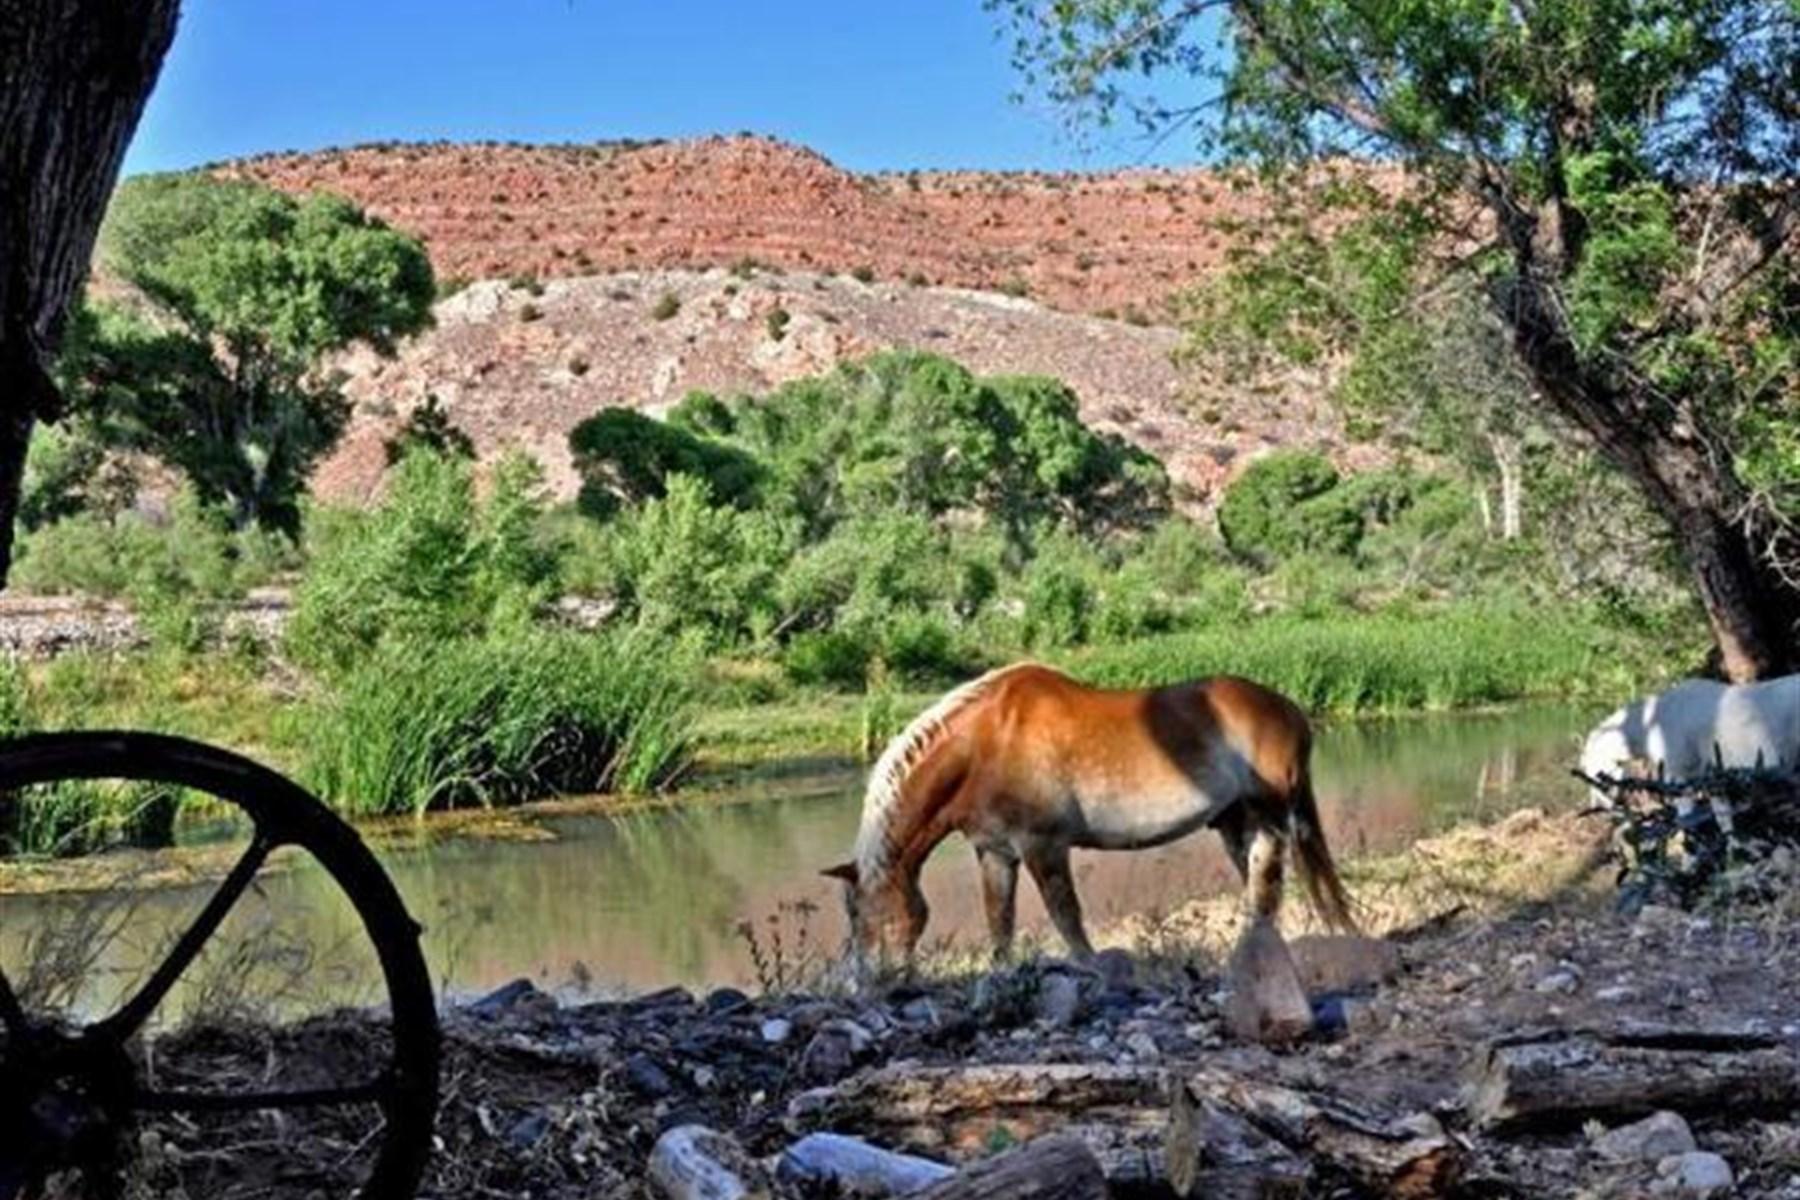 Moradia para Venda às Exquisite Piece of the West rarely 1111 E Perkinsville Rd Chino Valley, Arizona, 86323 Estados Unidos